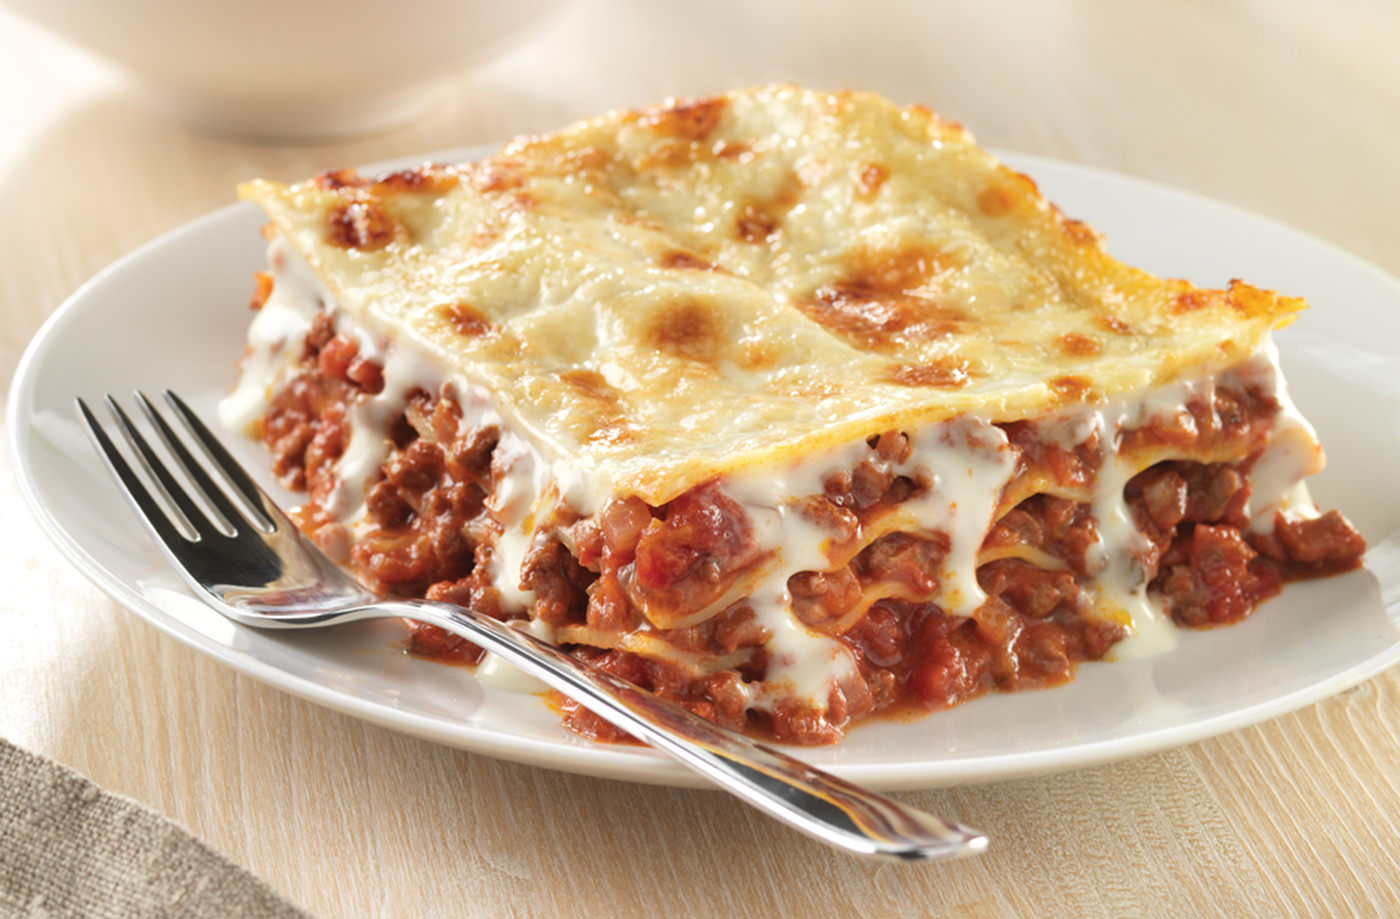 Simple-Lasagne-LGH-mini-05c6a22f-e7aa-4f6b-a174-b95b7d020a64-0-1400x919